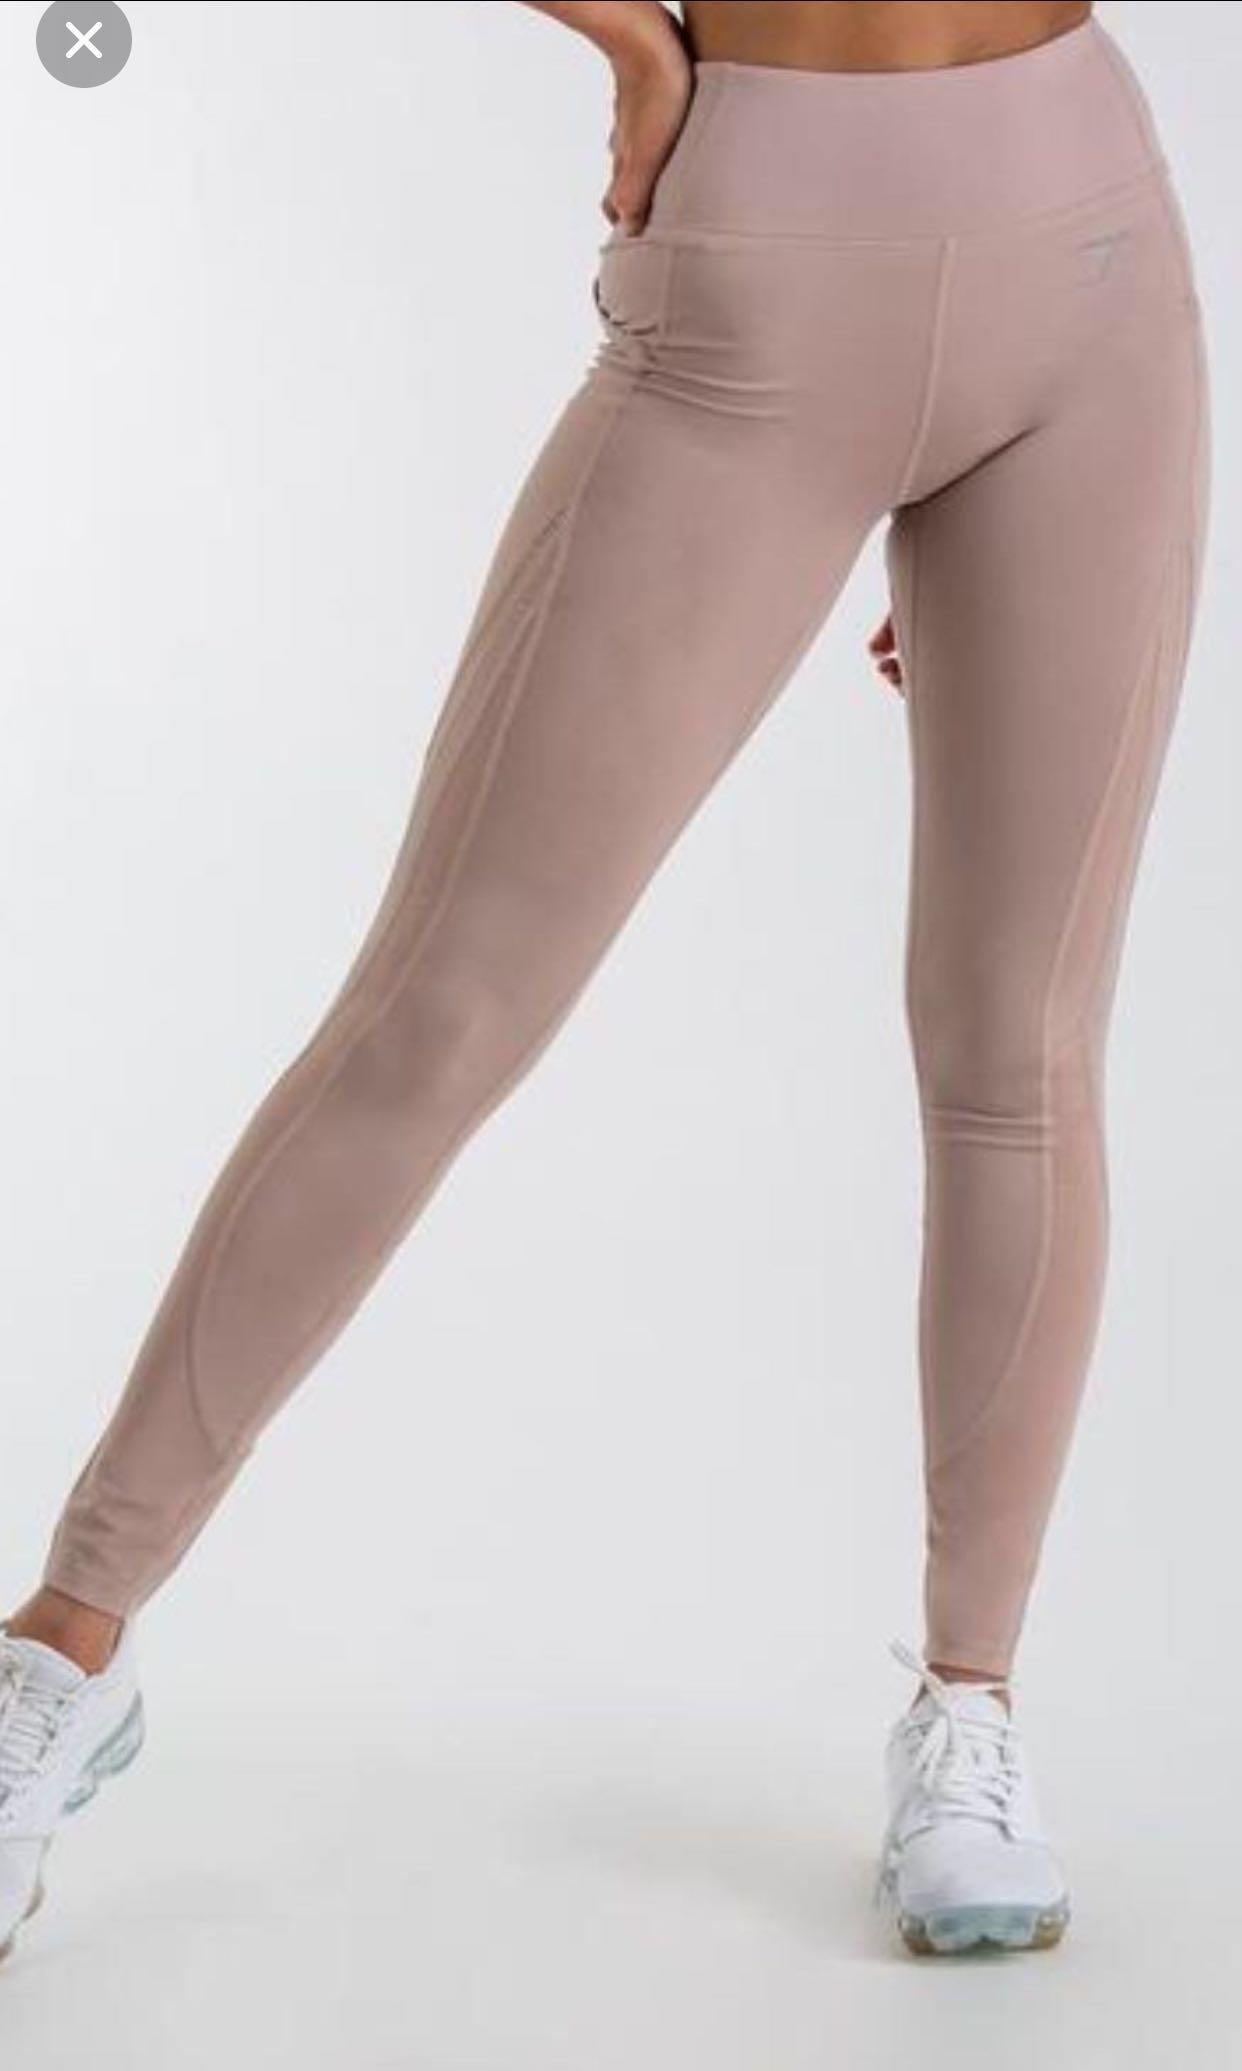 b464785eccf05e Gymshark sleek sculpture leggings, Sports, Sports Apparel on Carousell